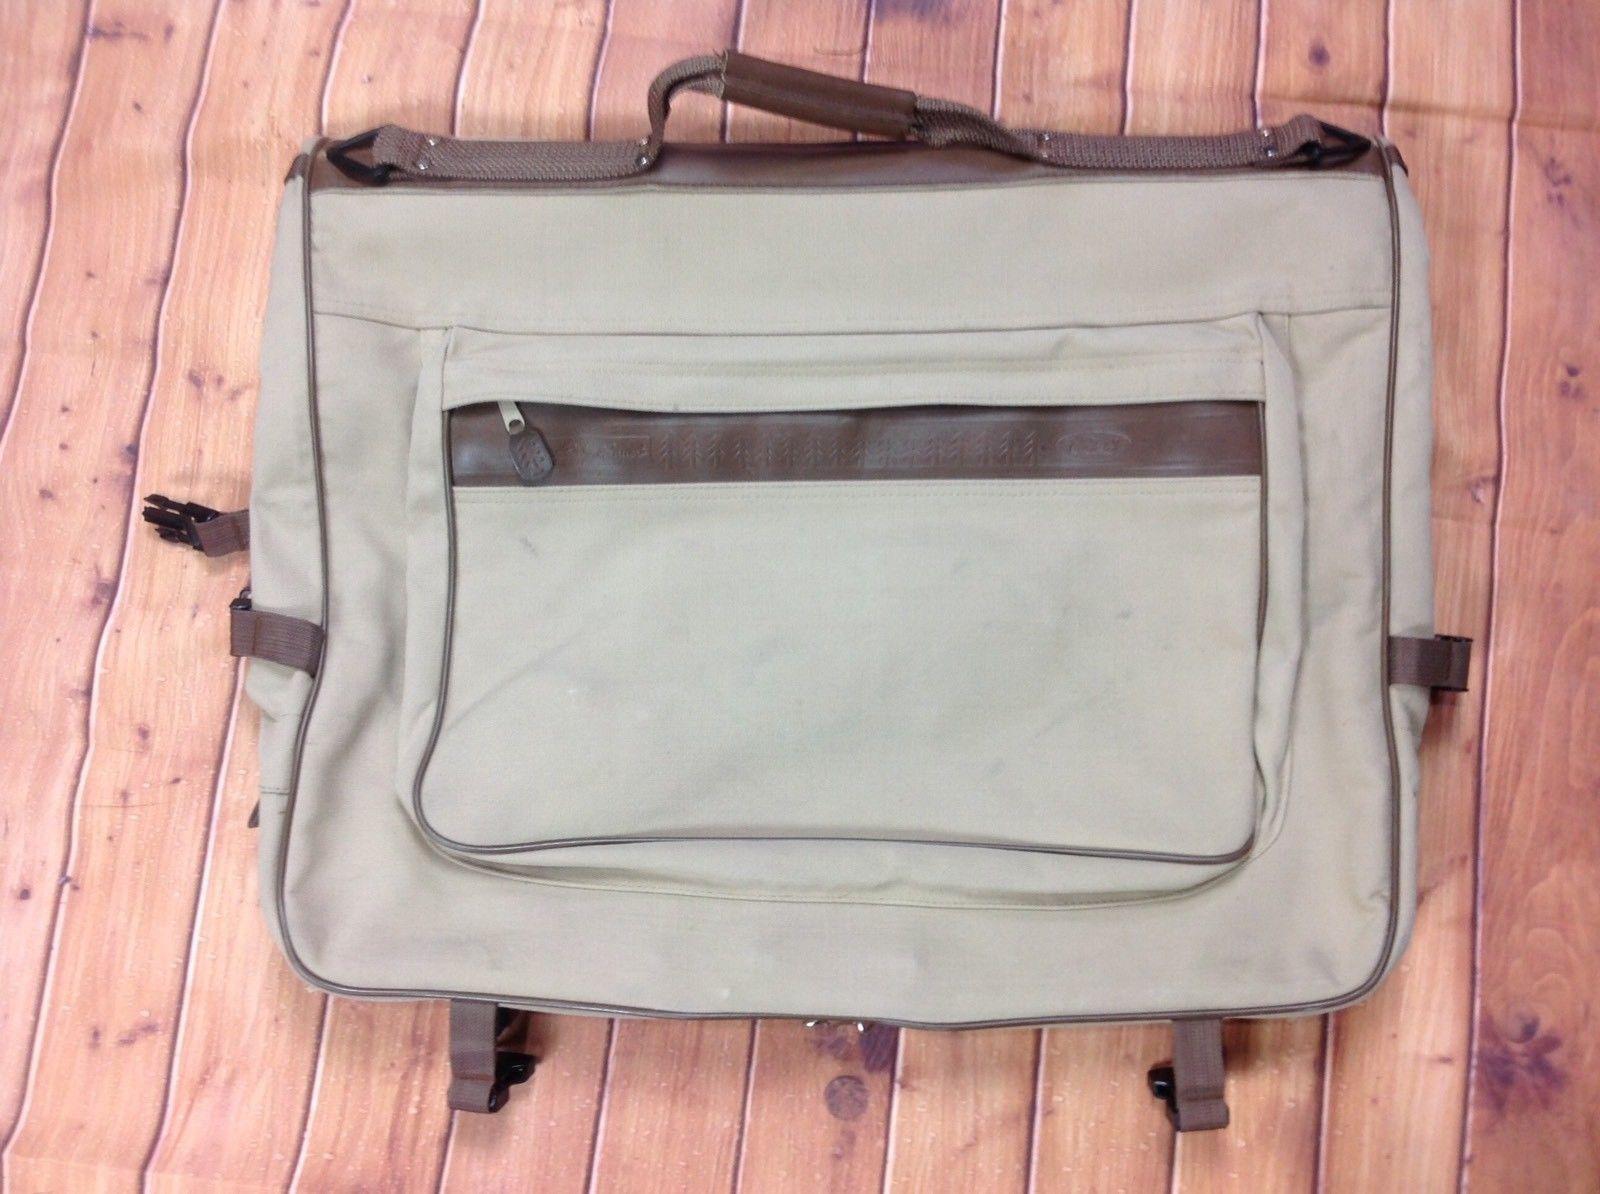 c60724f6e802 Eddie Bauer Ford Tan Canvas Folding Hanging Suit Garment Bag Dress Luggage  Beige